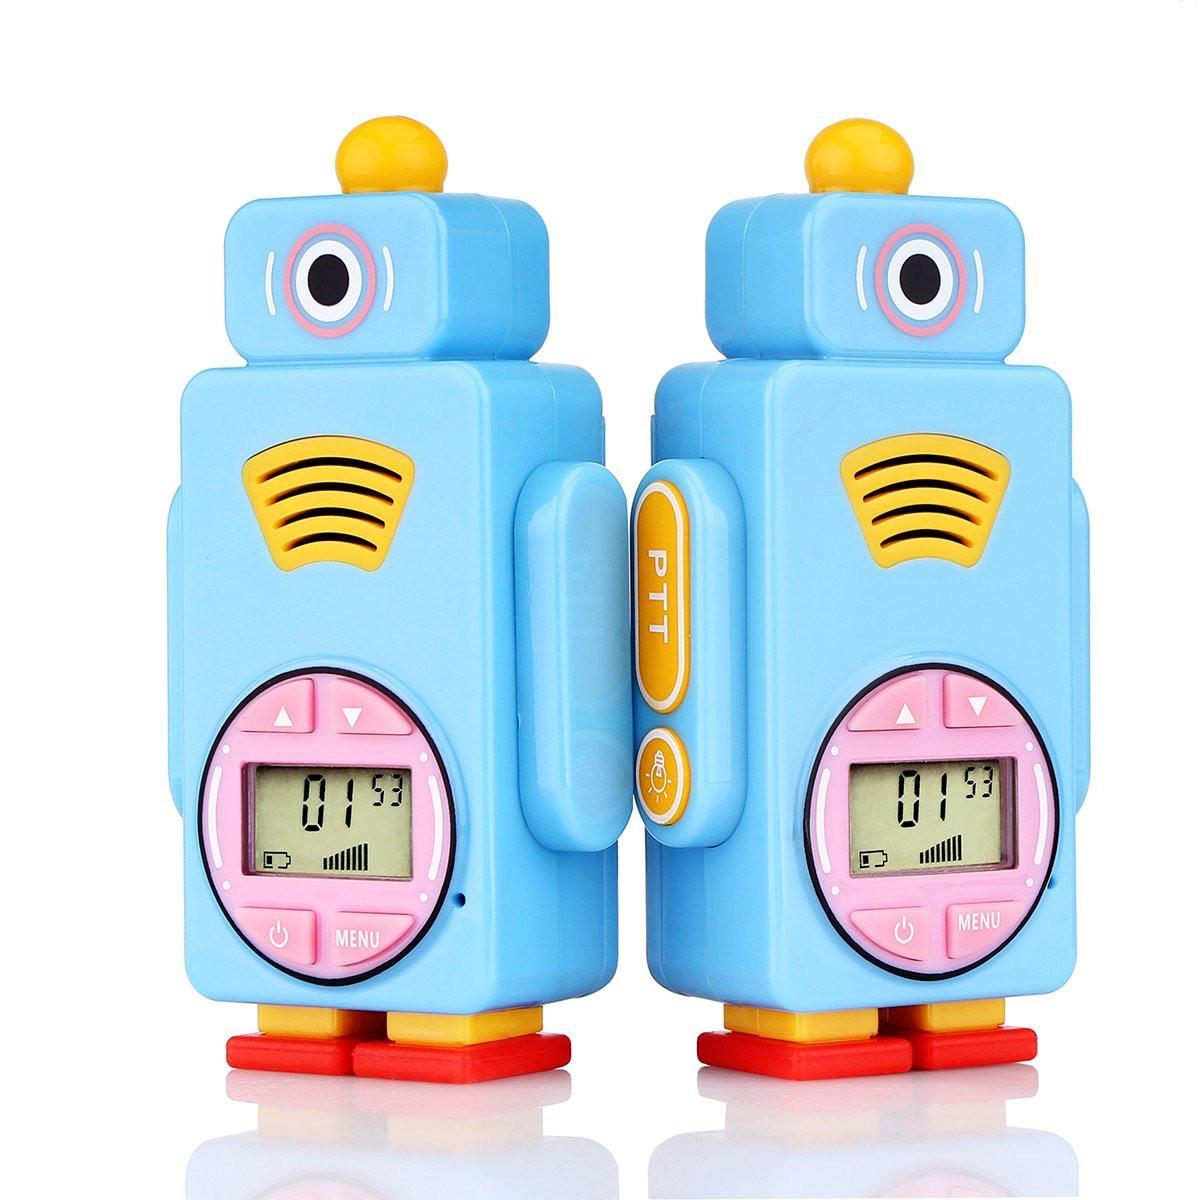 Retevis RT36 Kids Walkie Talkies Robot Toy long Range Crystal voice 14  Channels Vox Flash Light Best Walkie Talkie Rechargeable for Kids (2,pack)